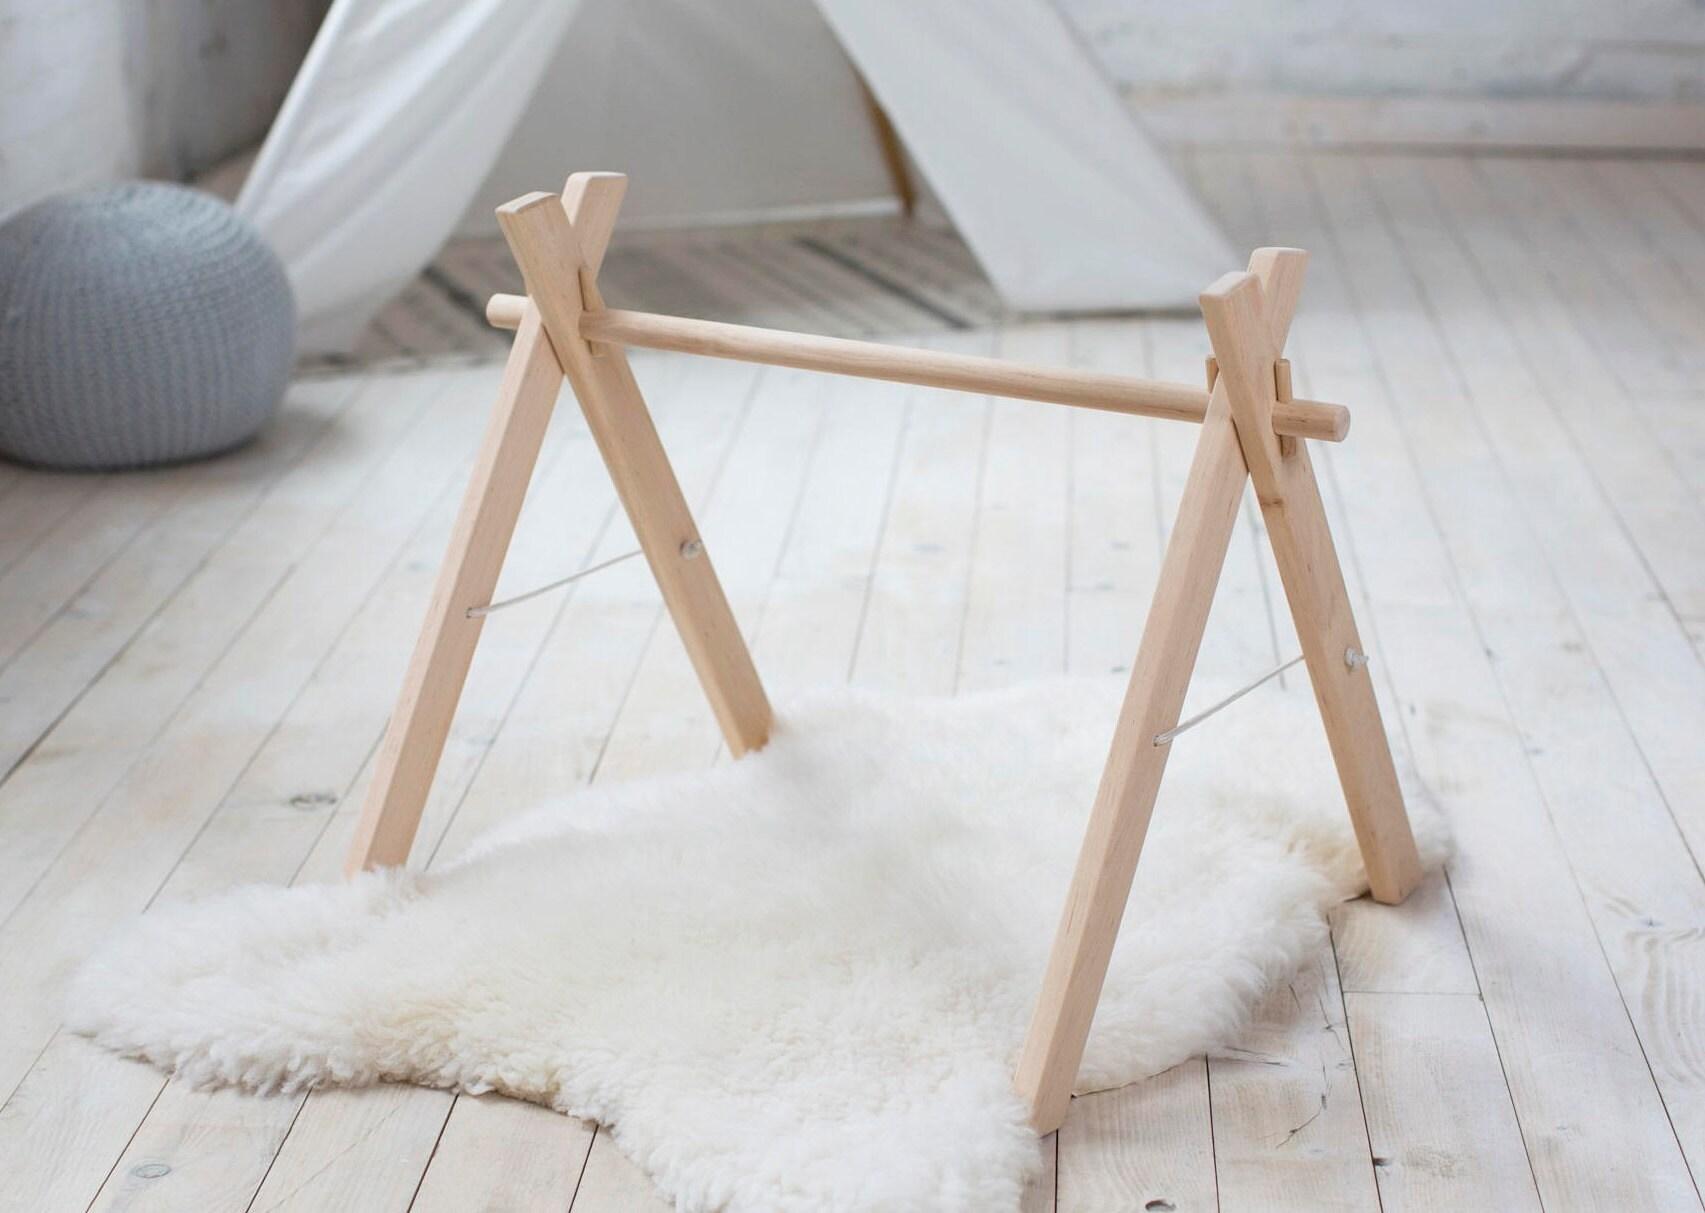 Holz Baby Gym Rahmen faltbar zu spielen Fitness-Studio | Etsy